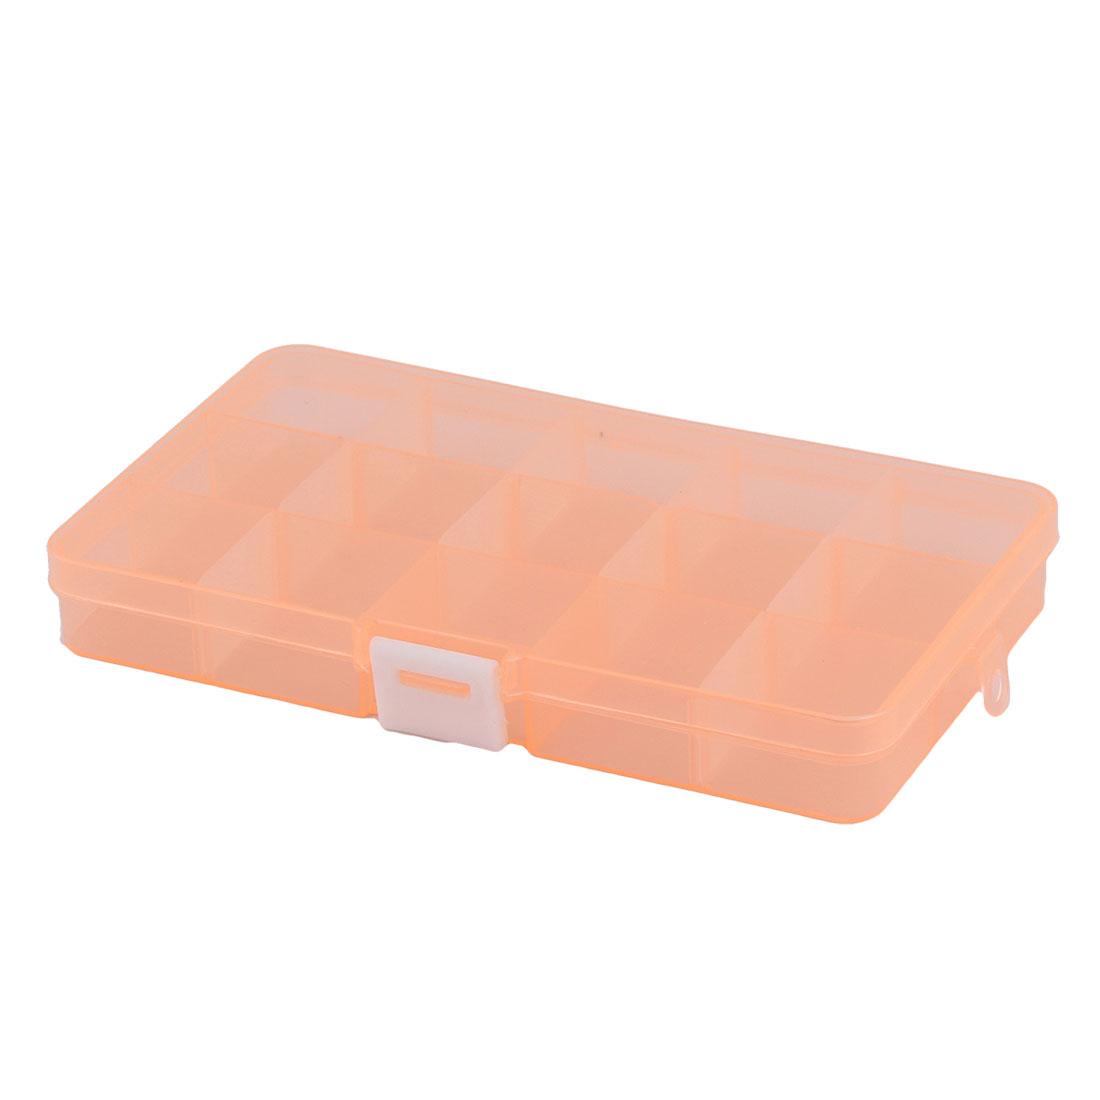 Home Desk Jewelry Bead Nail 15 Grid Storage Case Box Organizer Clear Orange